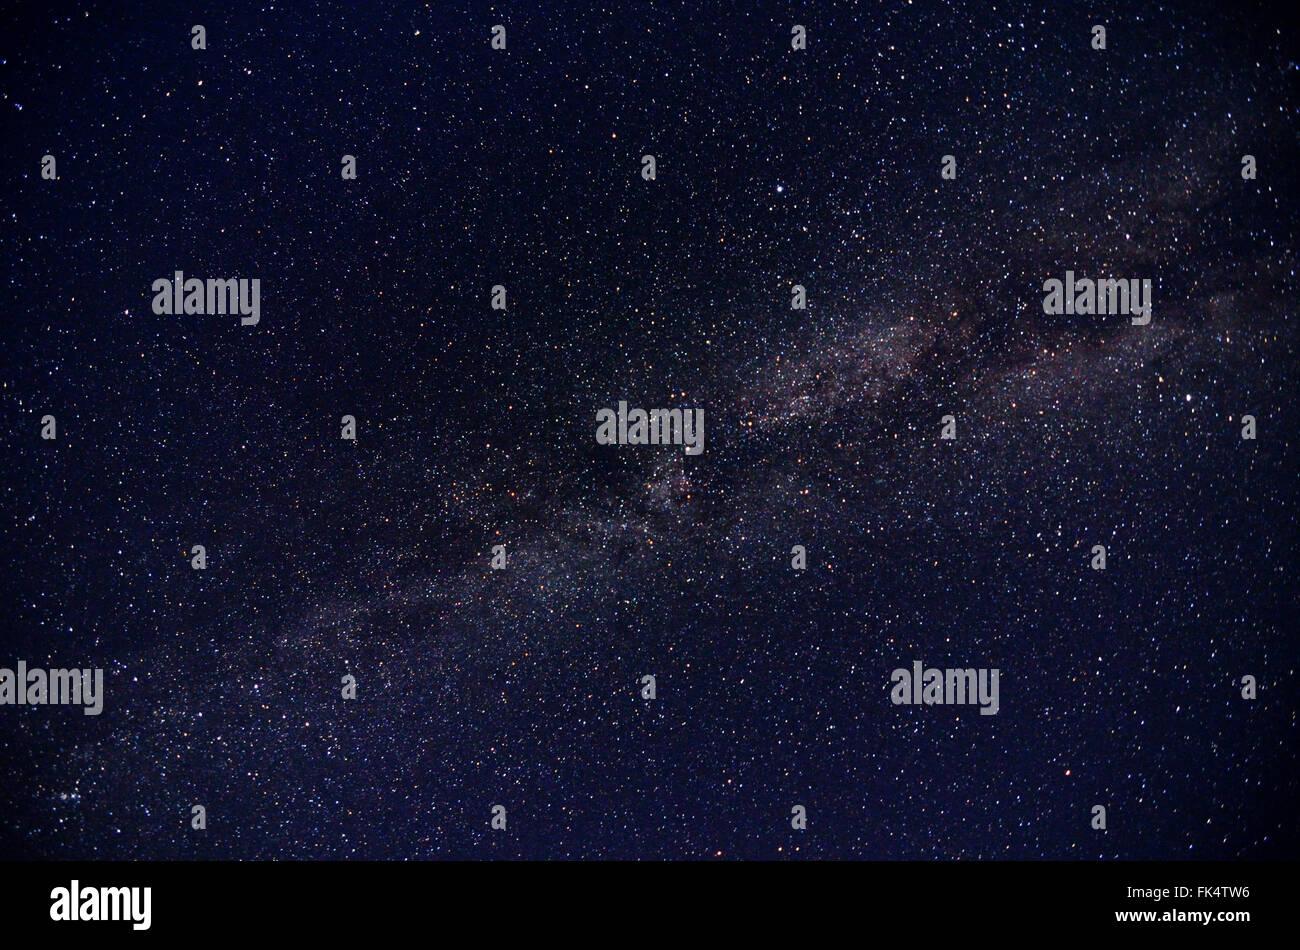 Milky way galaxy - Stock Image